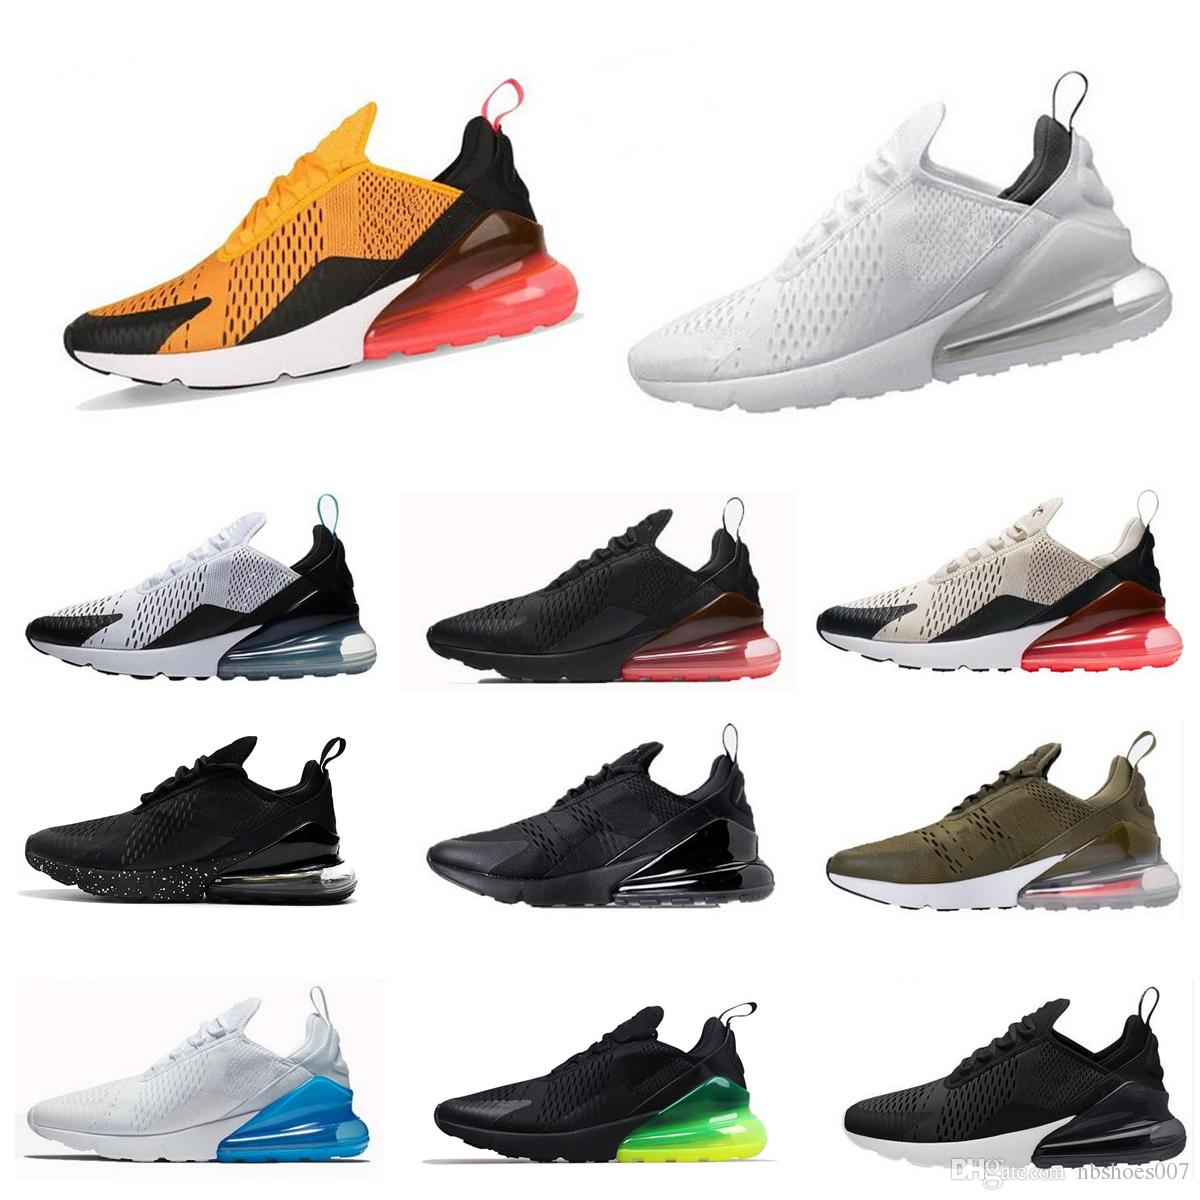 Acheter Chaude Vente 2018 Casual Chaussures Nike Air Max Airmax 270 Noir Blanc Jaune Gris Vert Rose 27c Hommes Femmes Sneakers Chaussures De Sport Eur ...